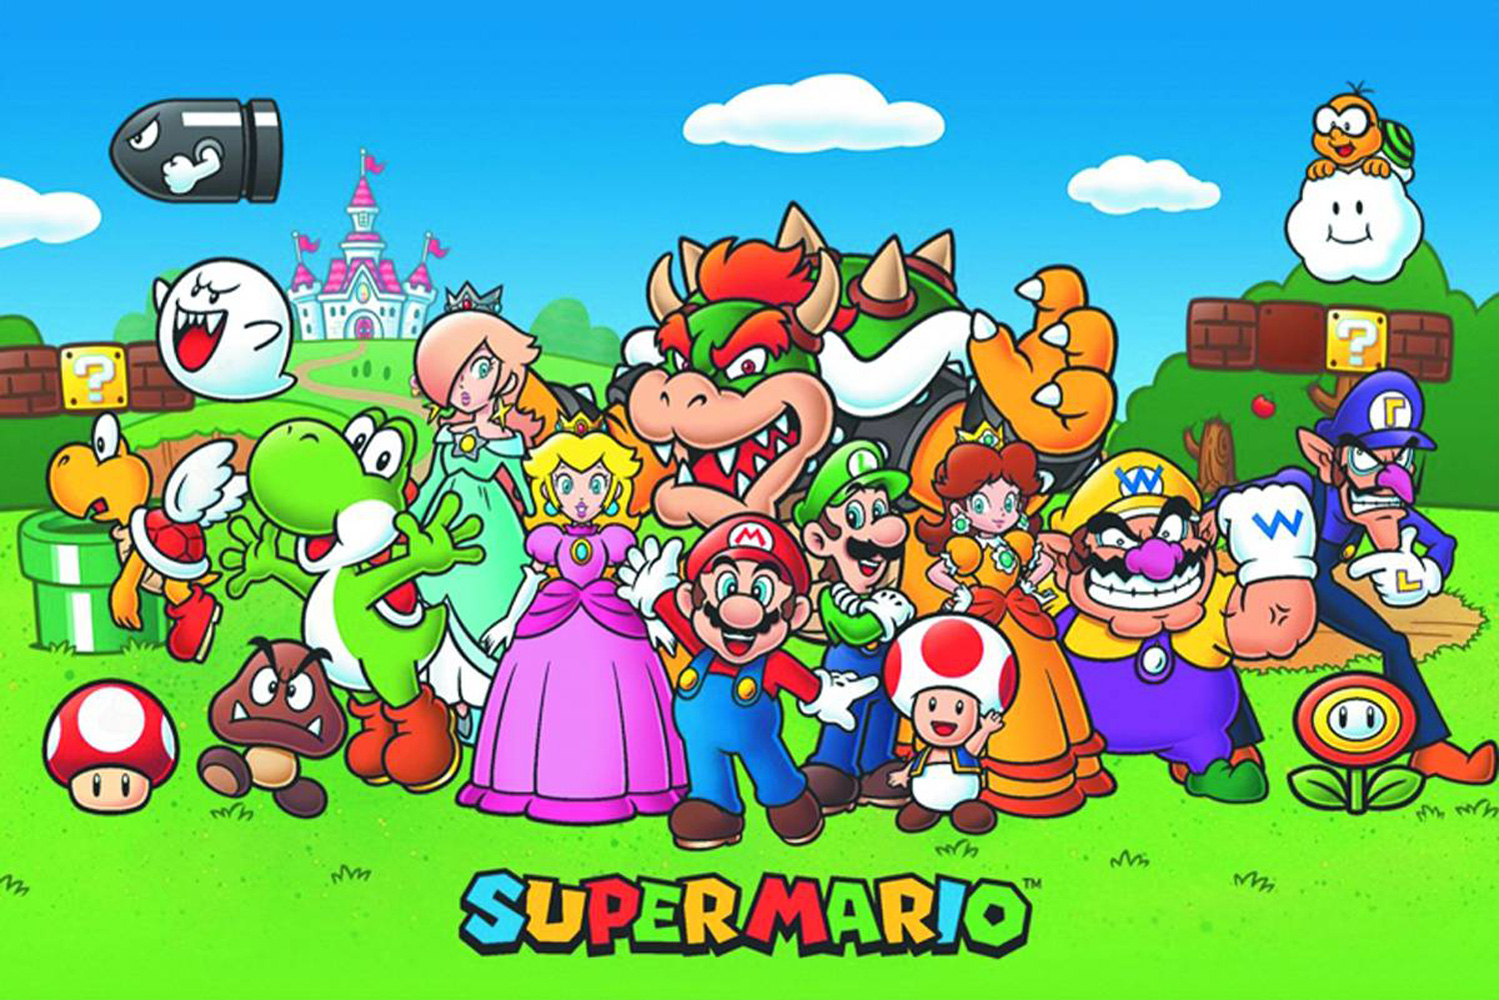 Super Mario Bros Poster Super Mario Animated 24x36